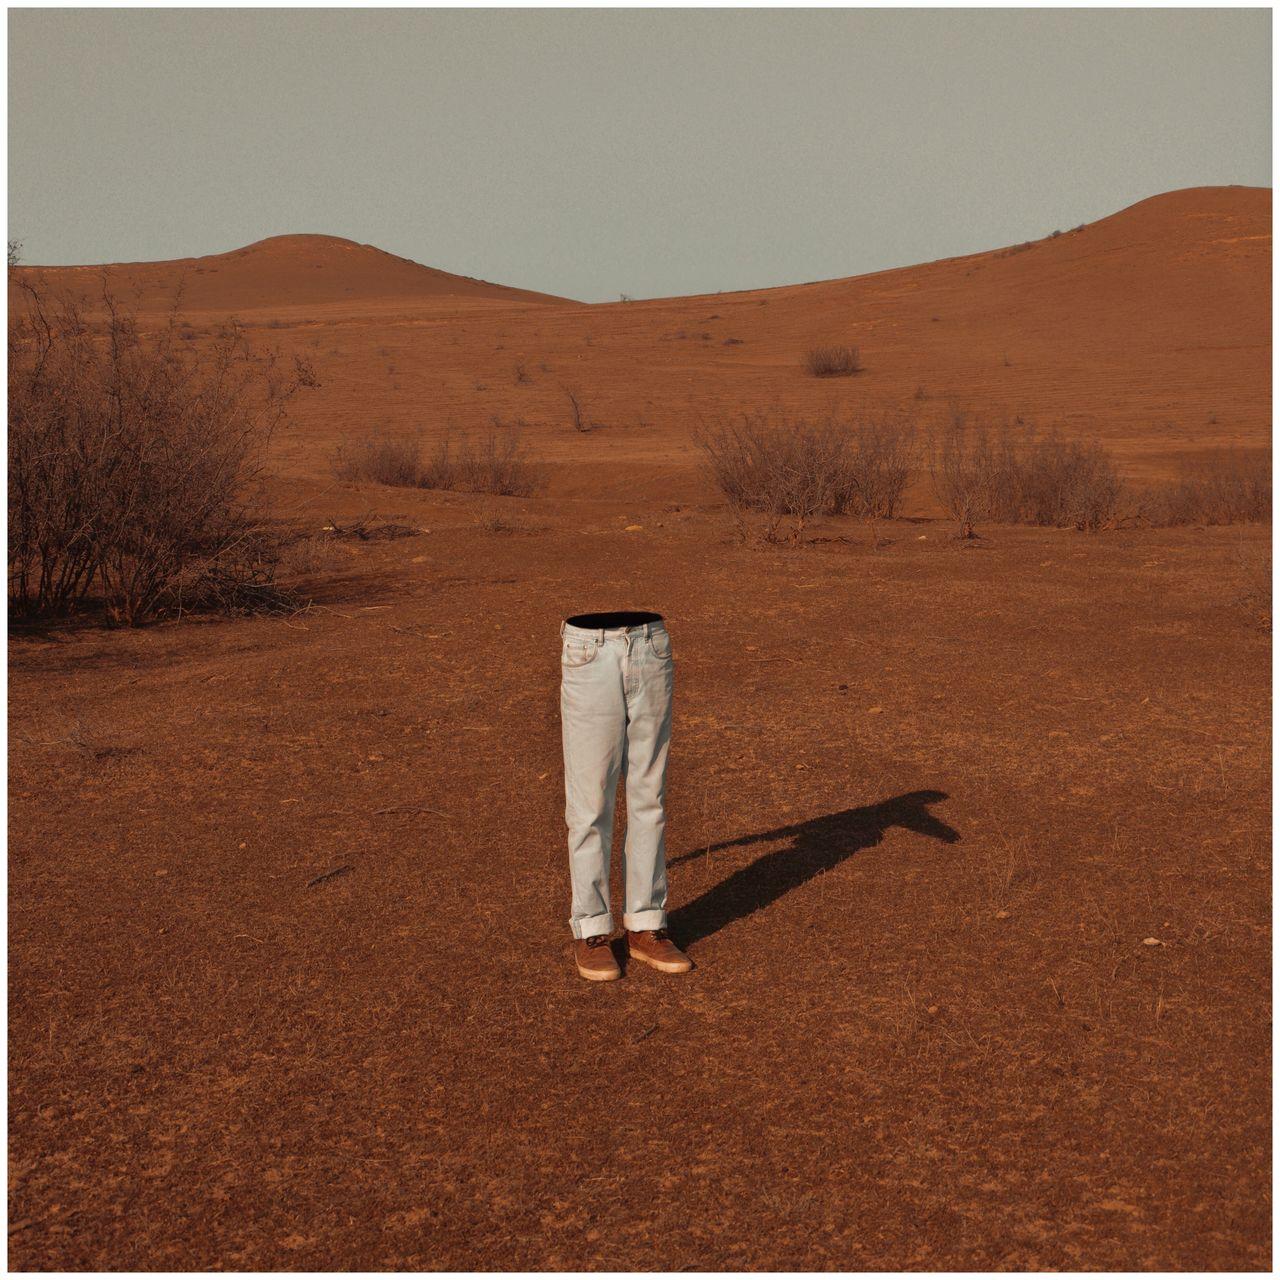 Man Standing On Sand In Desert Against Clear Sky